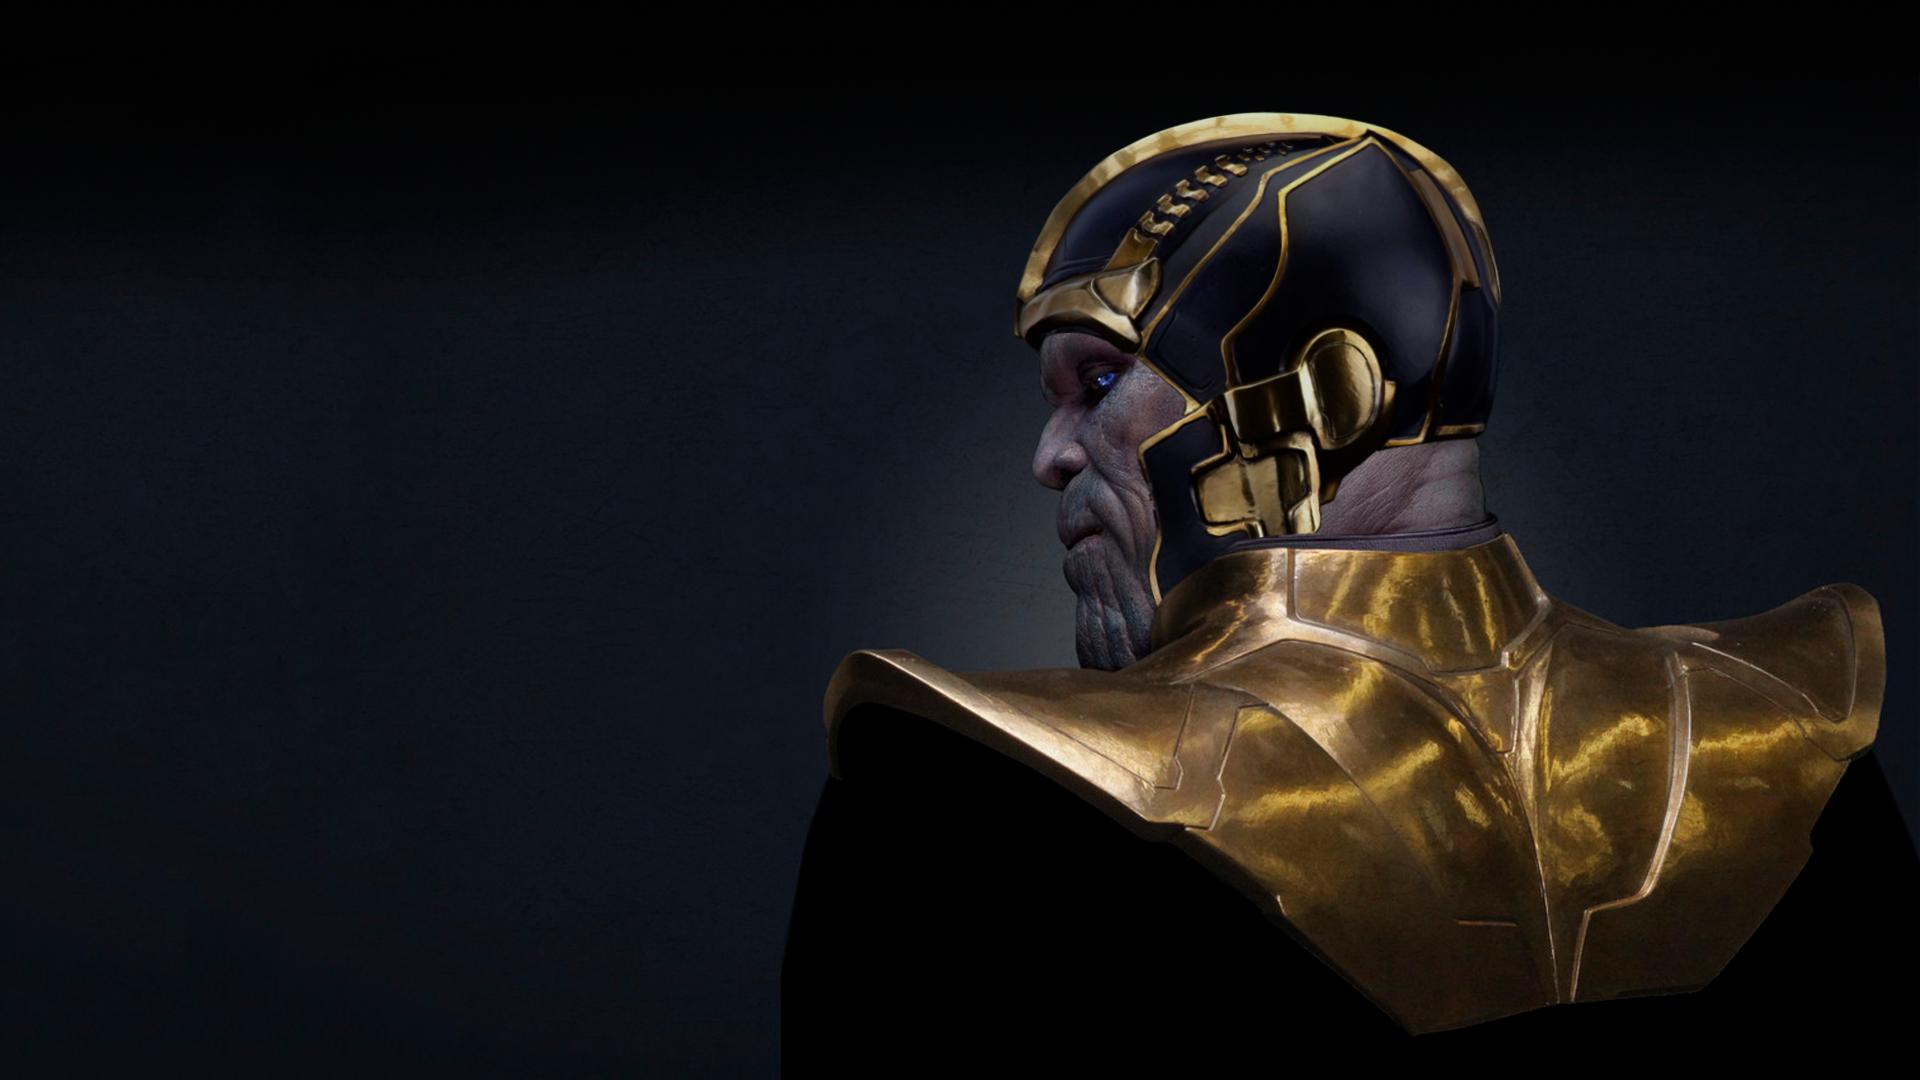 Thanos Avengers Real Life Wallpaper Mac Heat